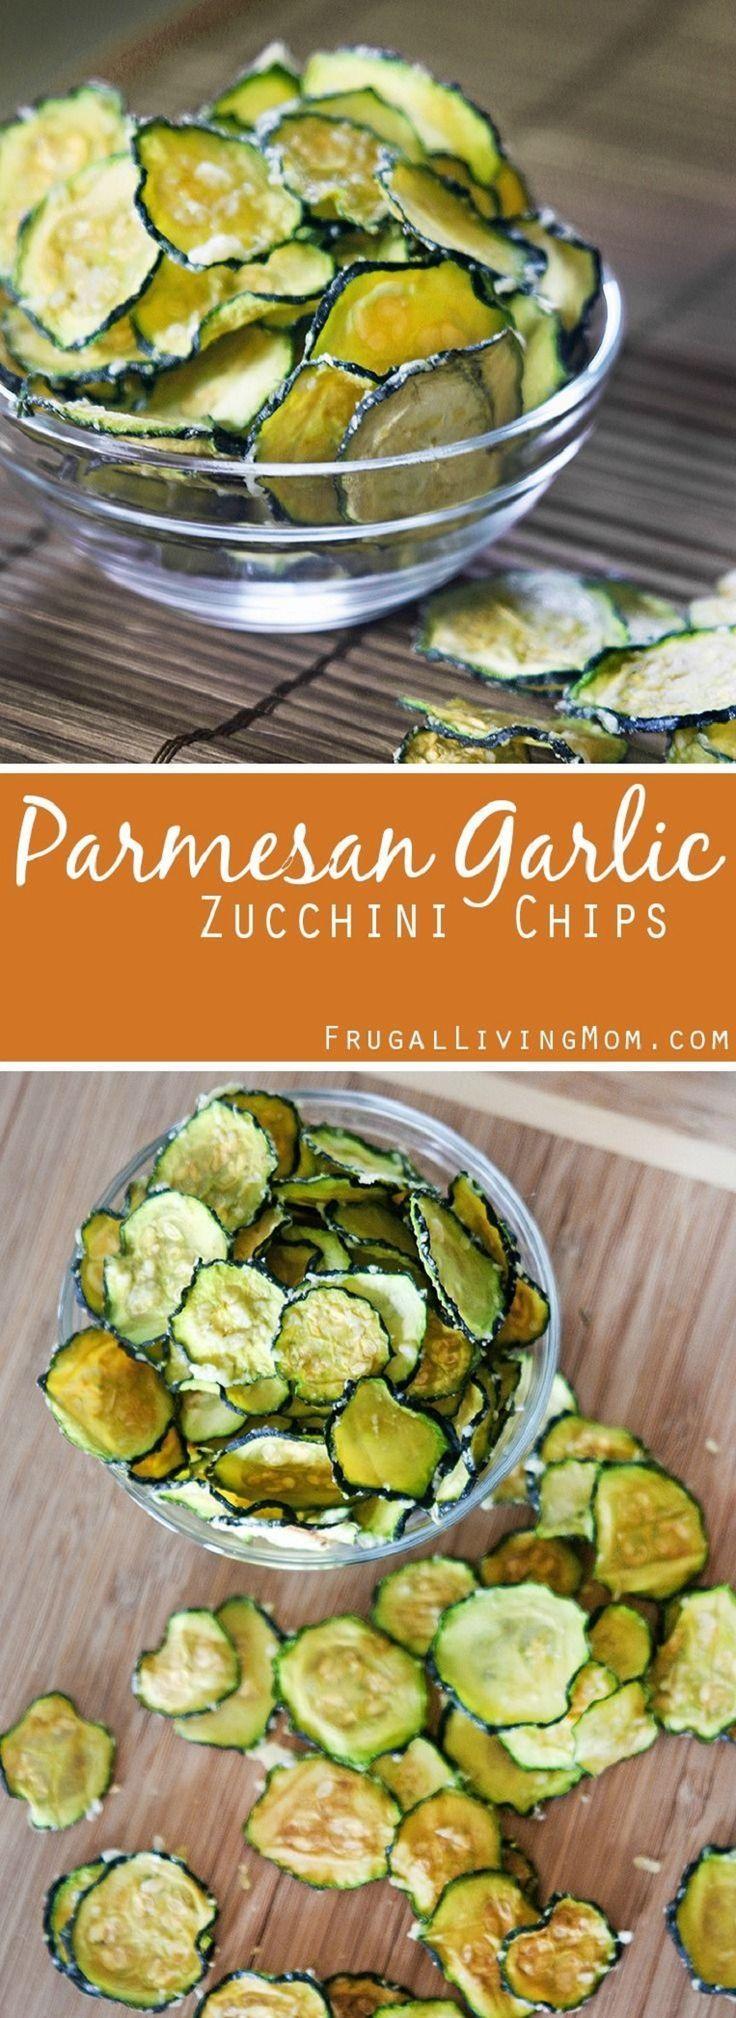 Lemon Garlic Zucchini